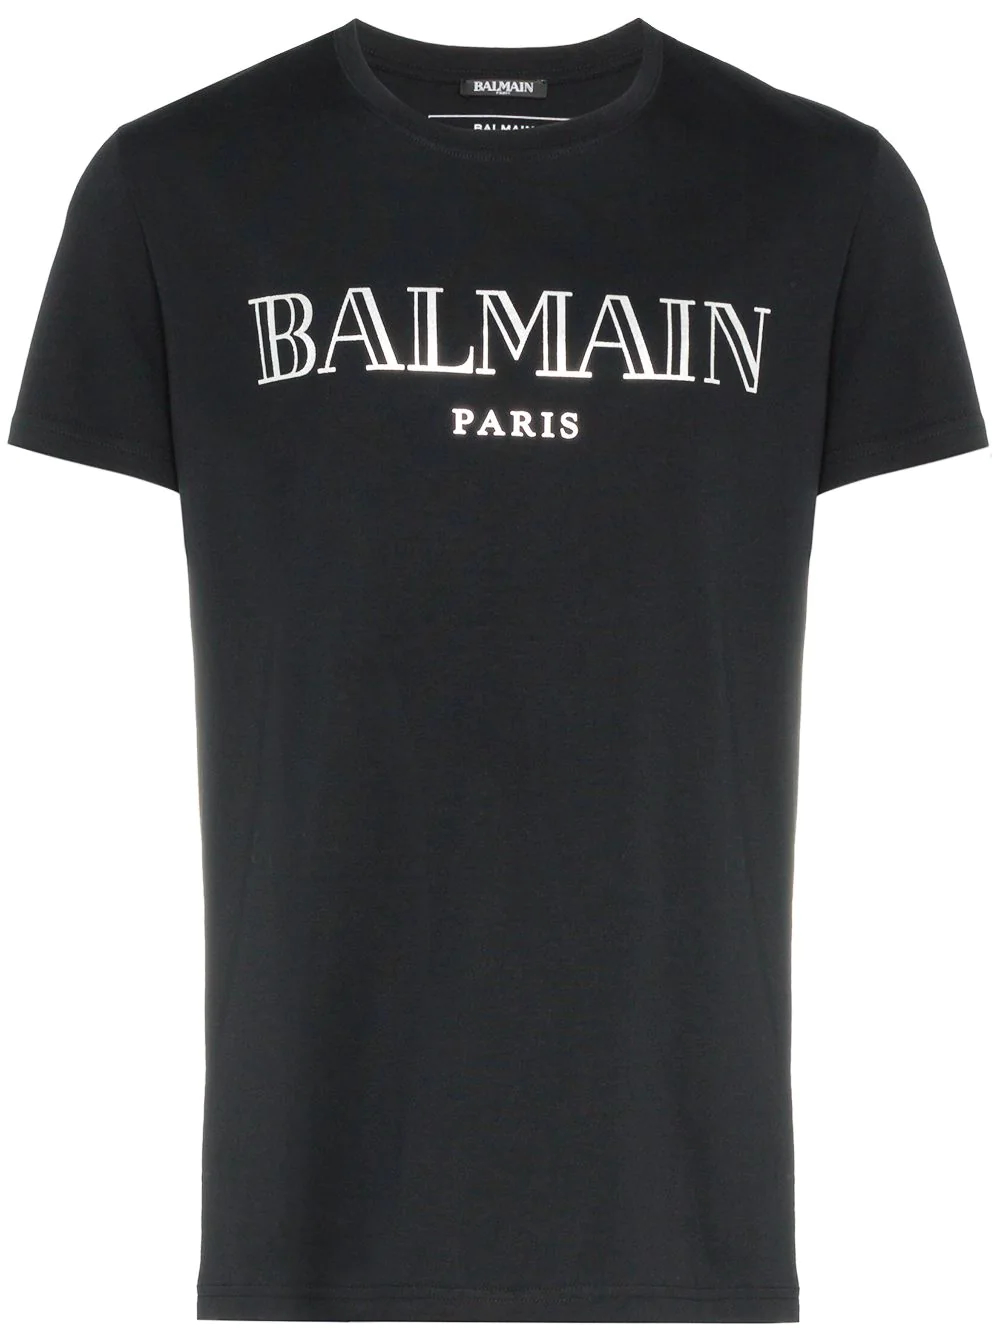 BALMAIN | футболка с короткими рукавами и принтом логотипа | Clouty